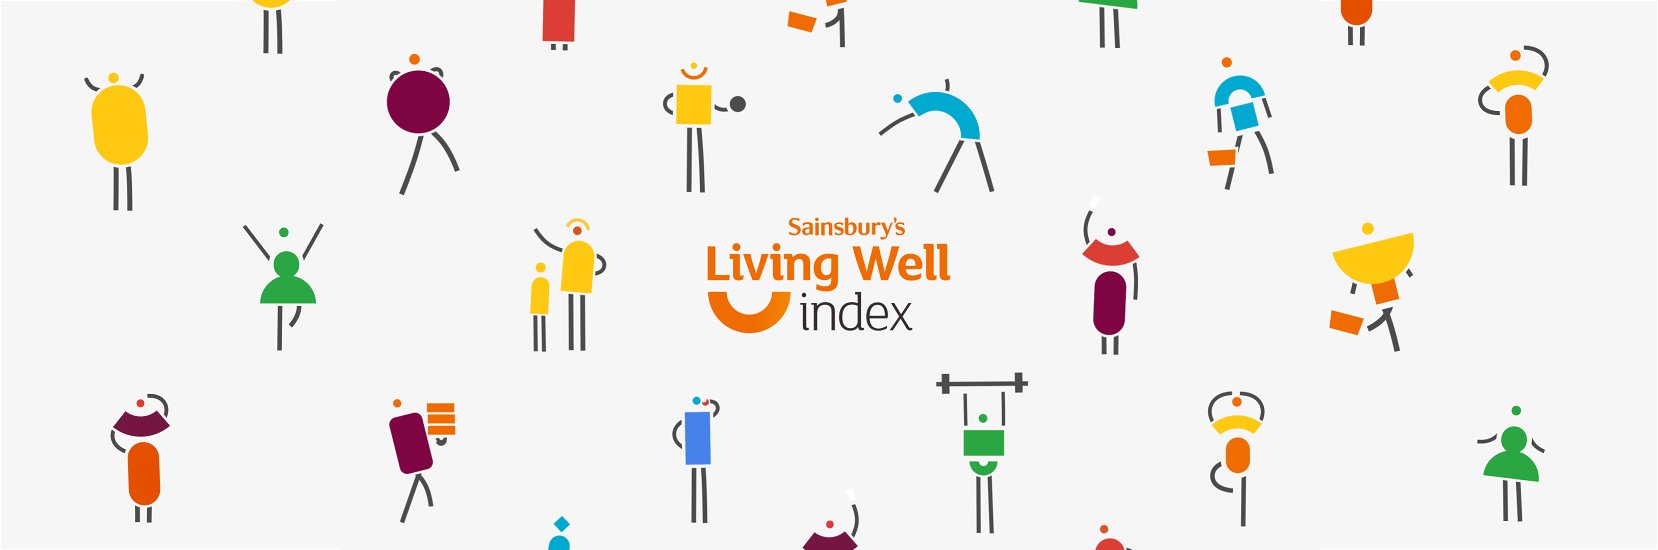 Living well index – Sainsbury's